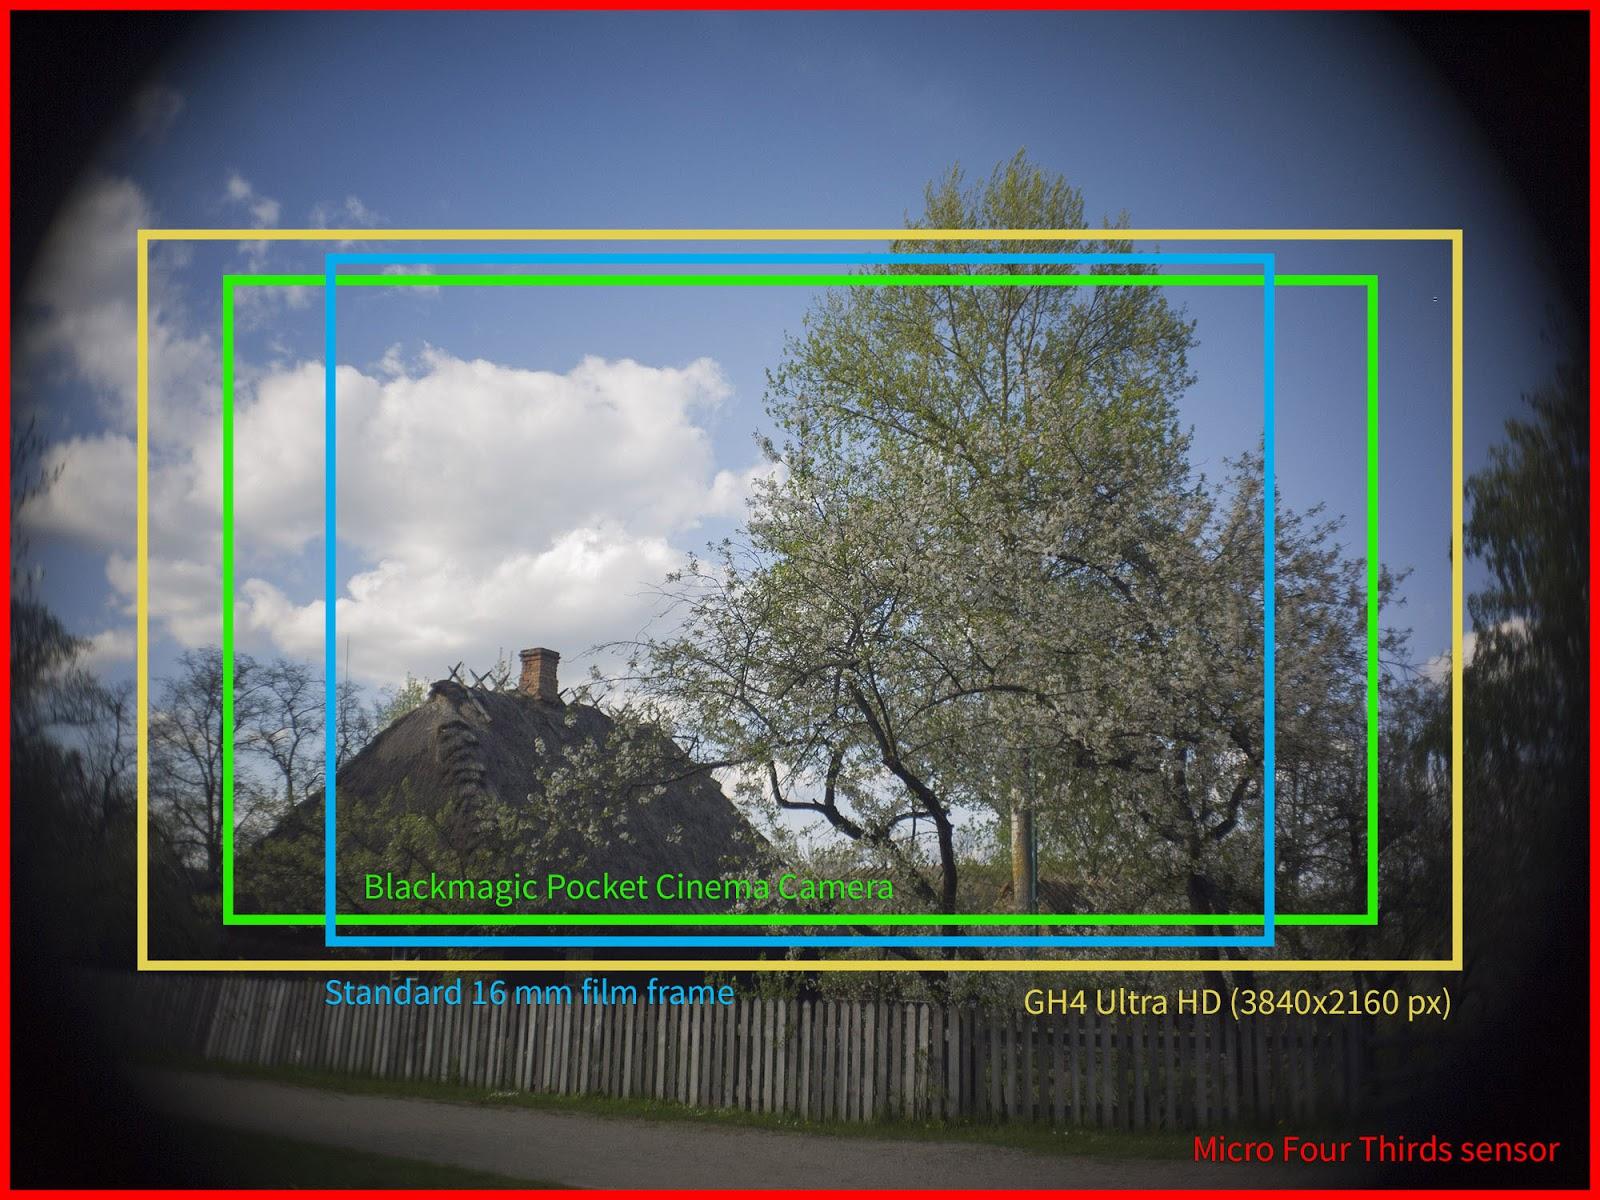 Tevidon 16/1.8 @1.8 - MFT, BMPCC, GH4 UltraHD sensor coverage.